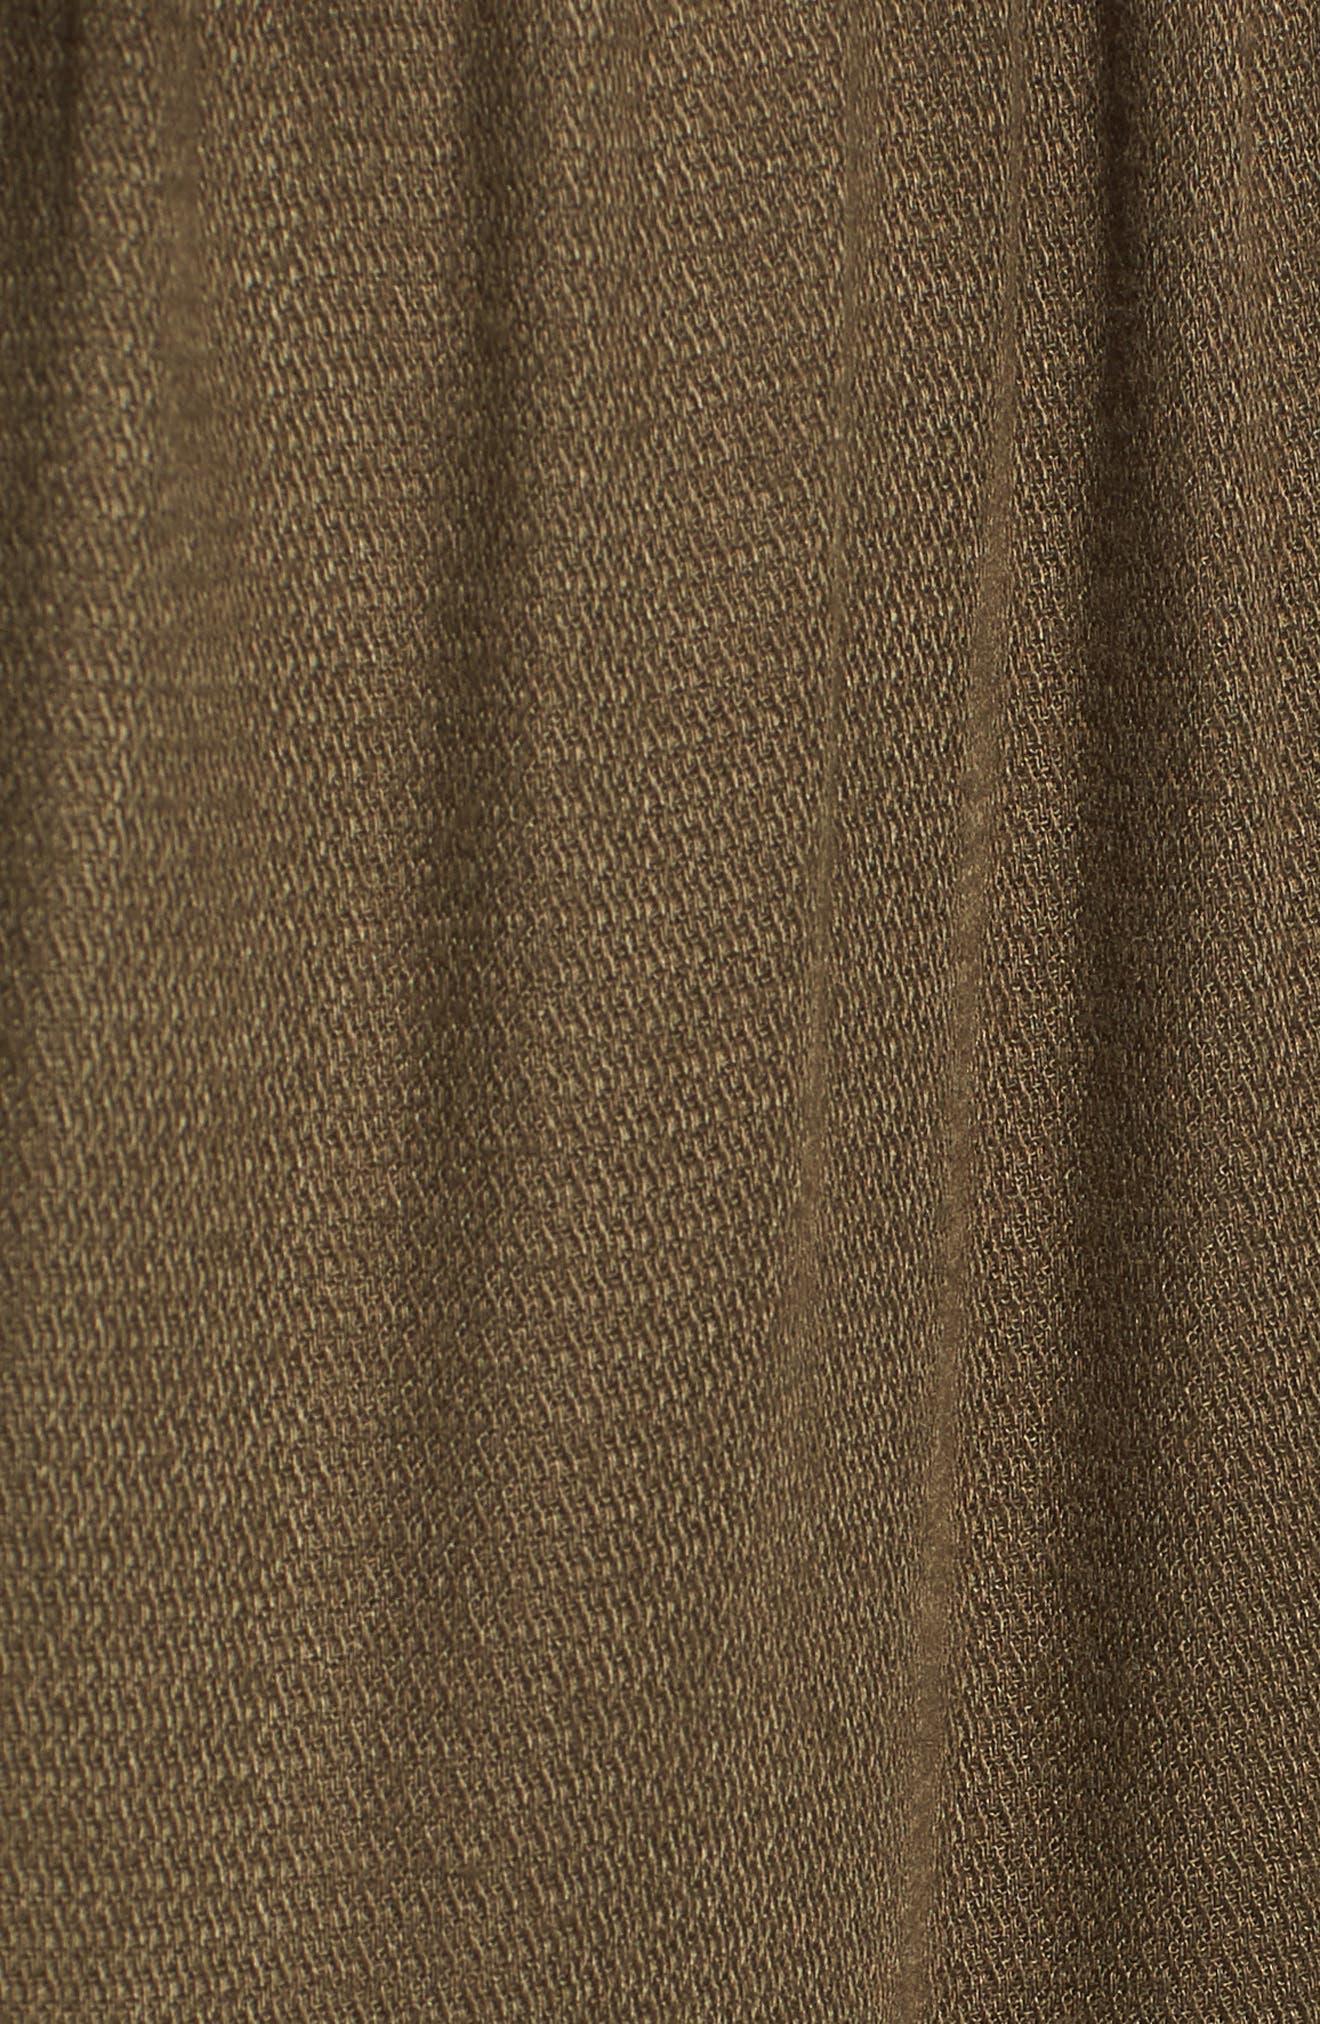 Vary Yume Shorts,                             Alternate thumbnail 6, color,                             Burnt Olive